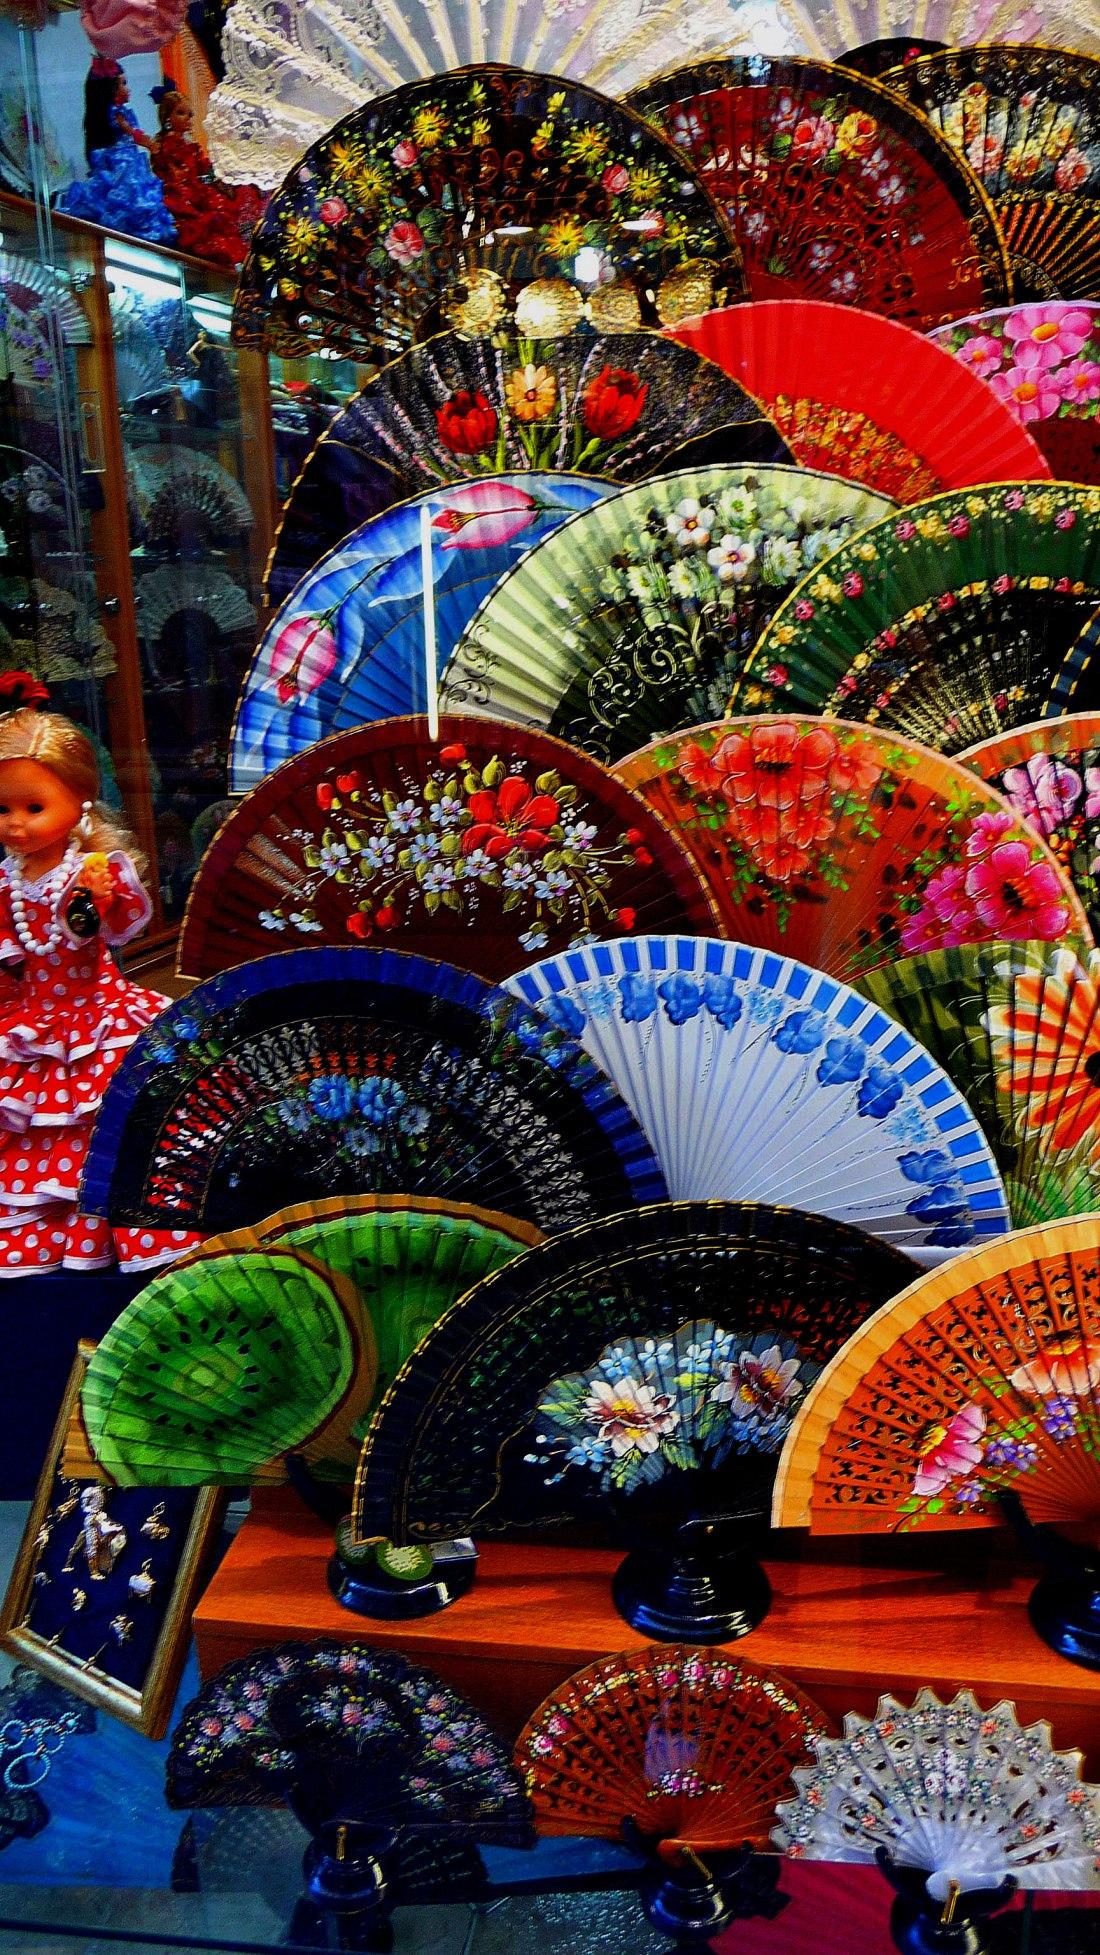 Abanicos,-Seville--(3).jpg